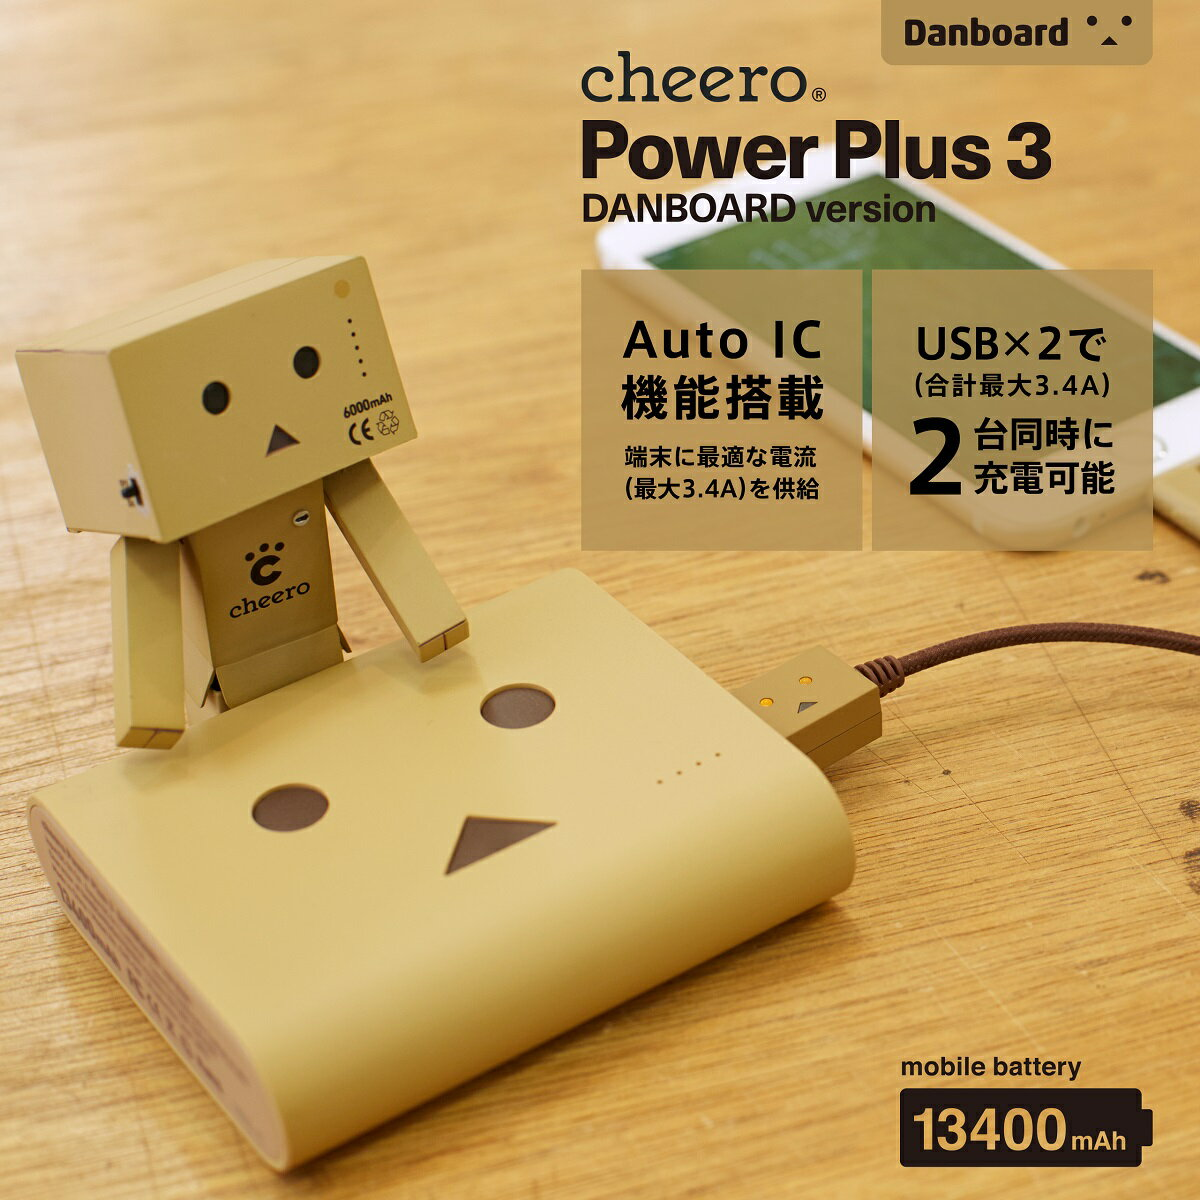 【PSEマーク付】大容量 ダンボー チーロ モバイルバッテリー  cheero Power Plus 3 13400mAh DANBOARD version 各種 iPhone / iPad / Android 急速充電 対応 電気用品安全法